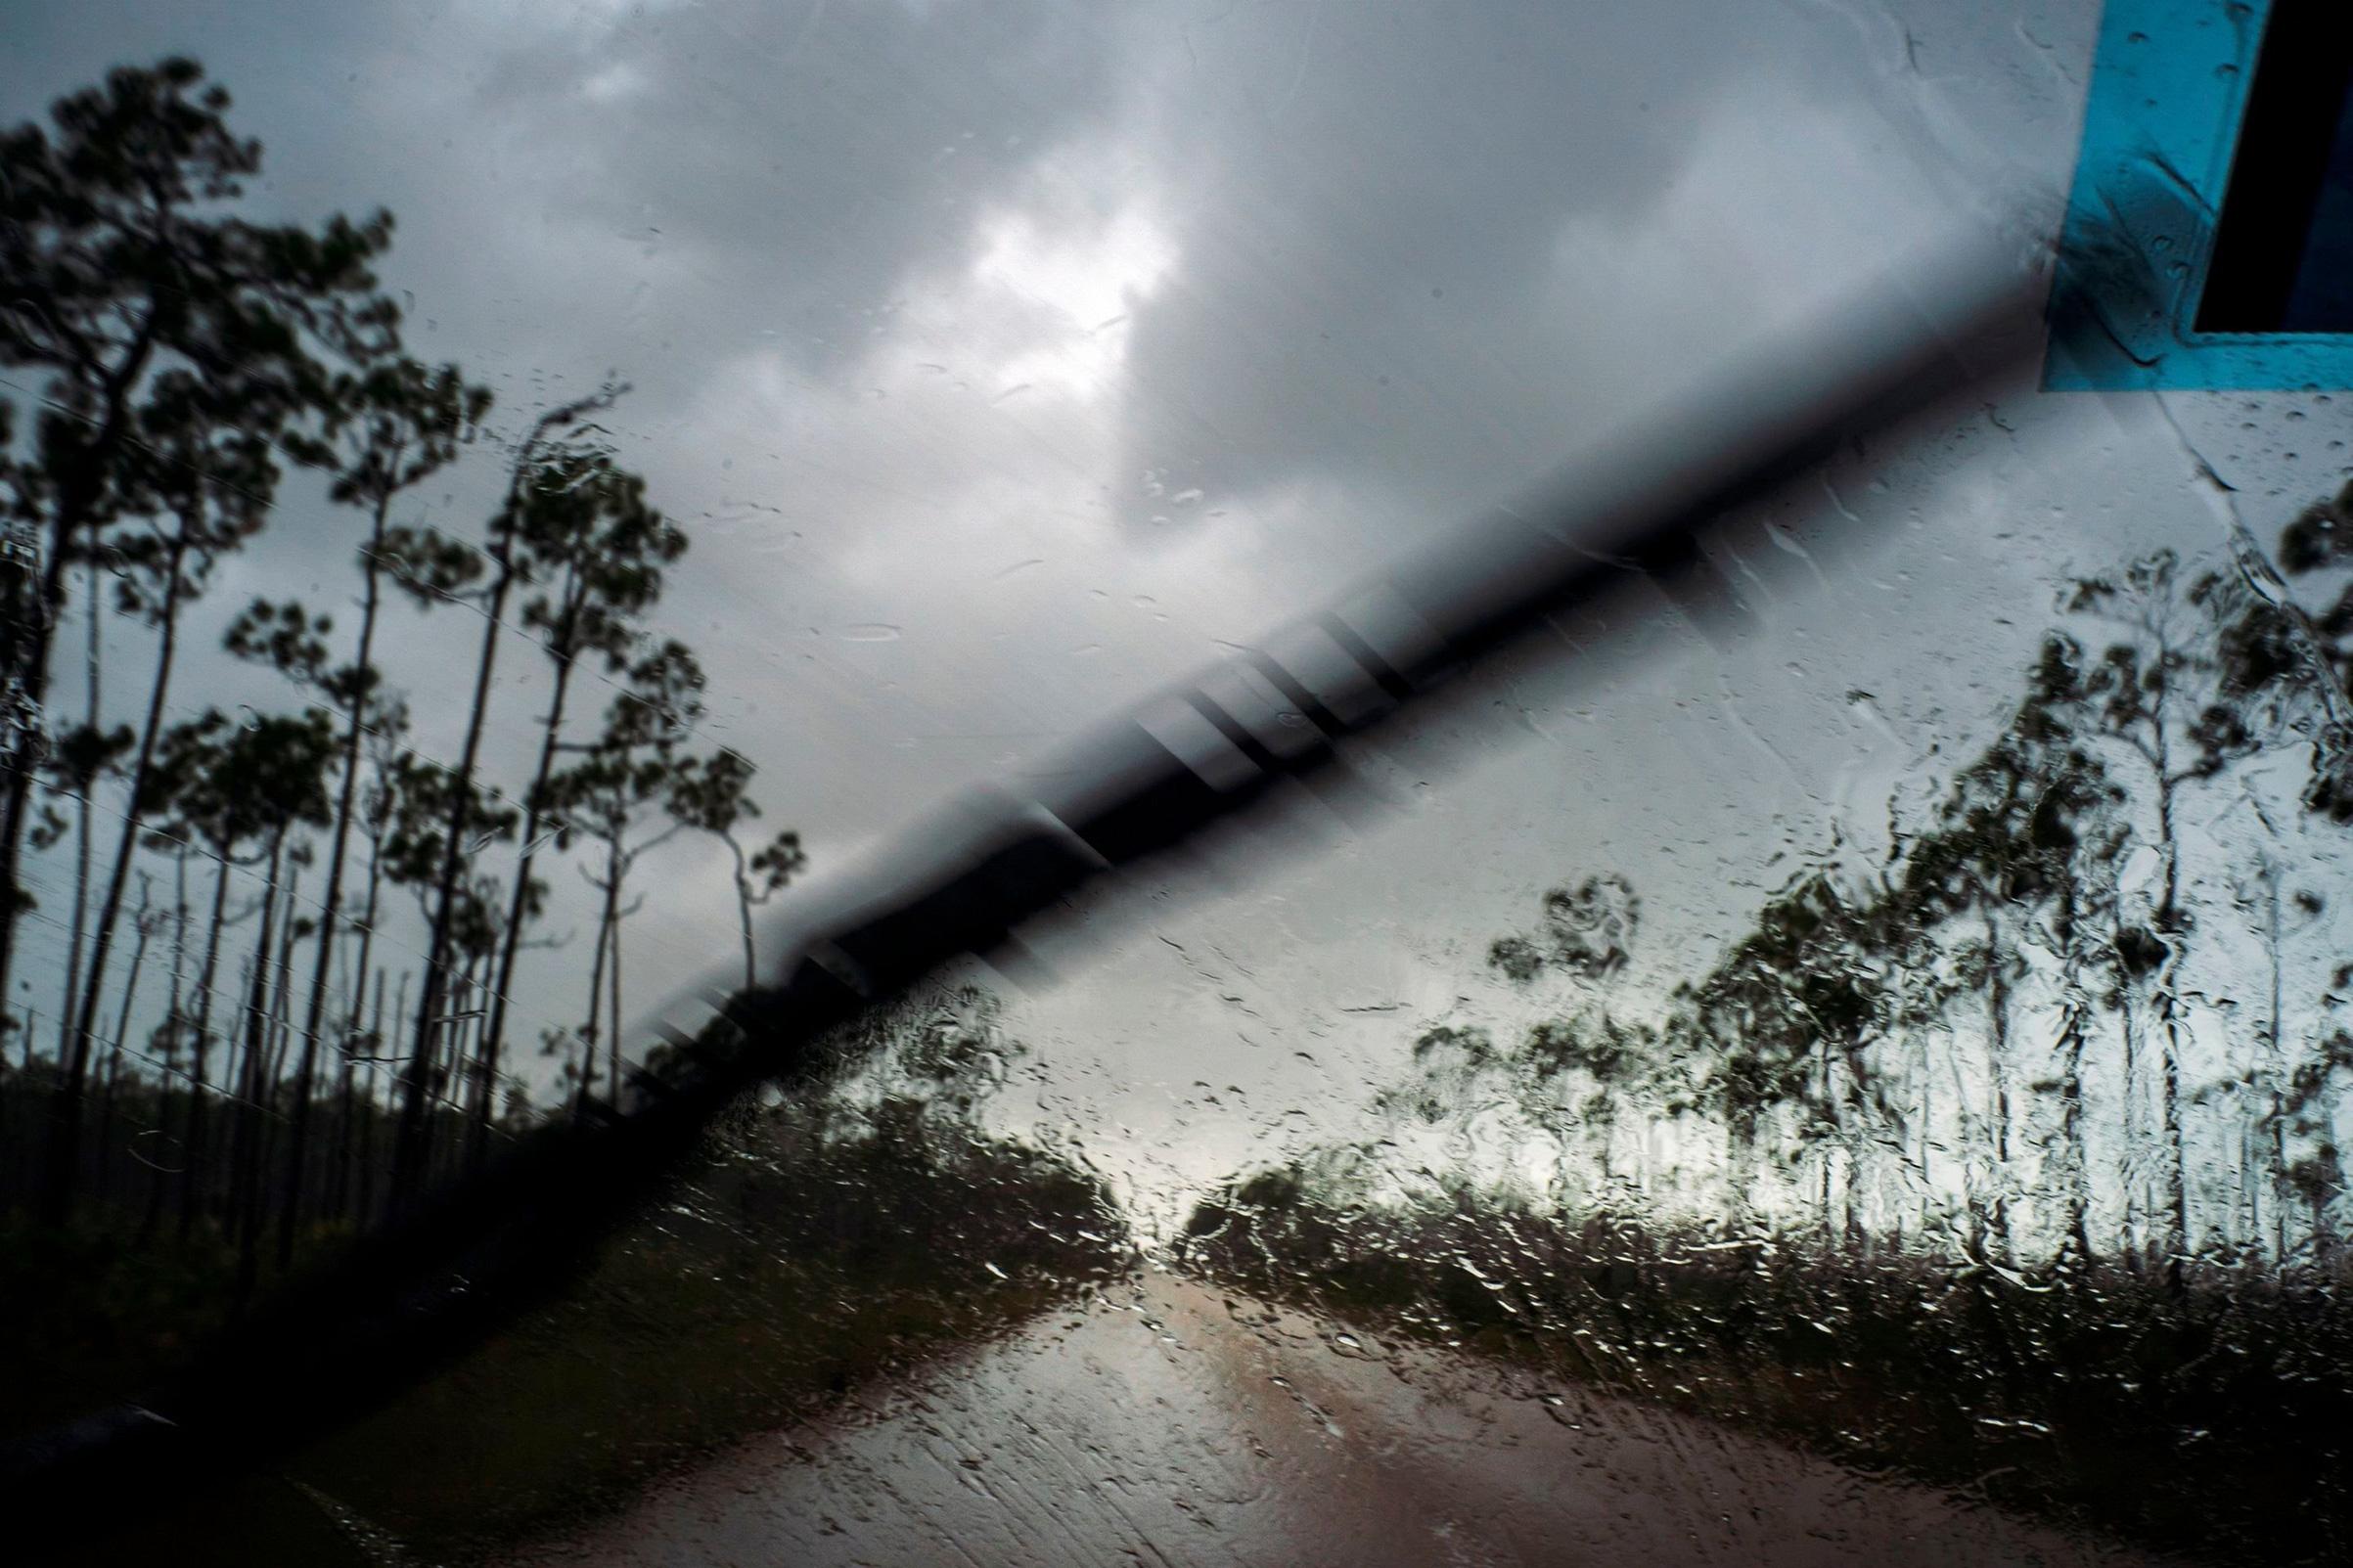 A car returns to the capital before the arrival of Hurricane Dorian in Freeport, Grand Bahama, Bahamas, Sept. 1, 2019.